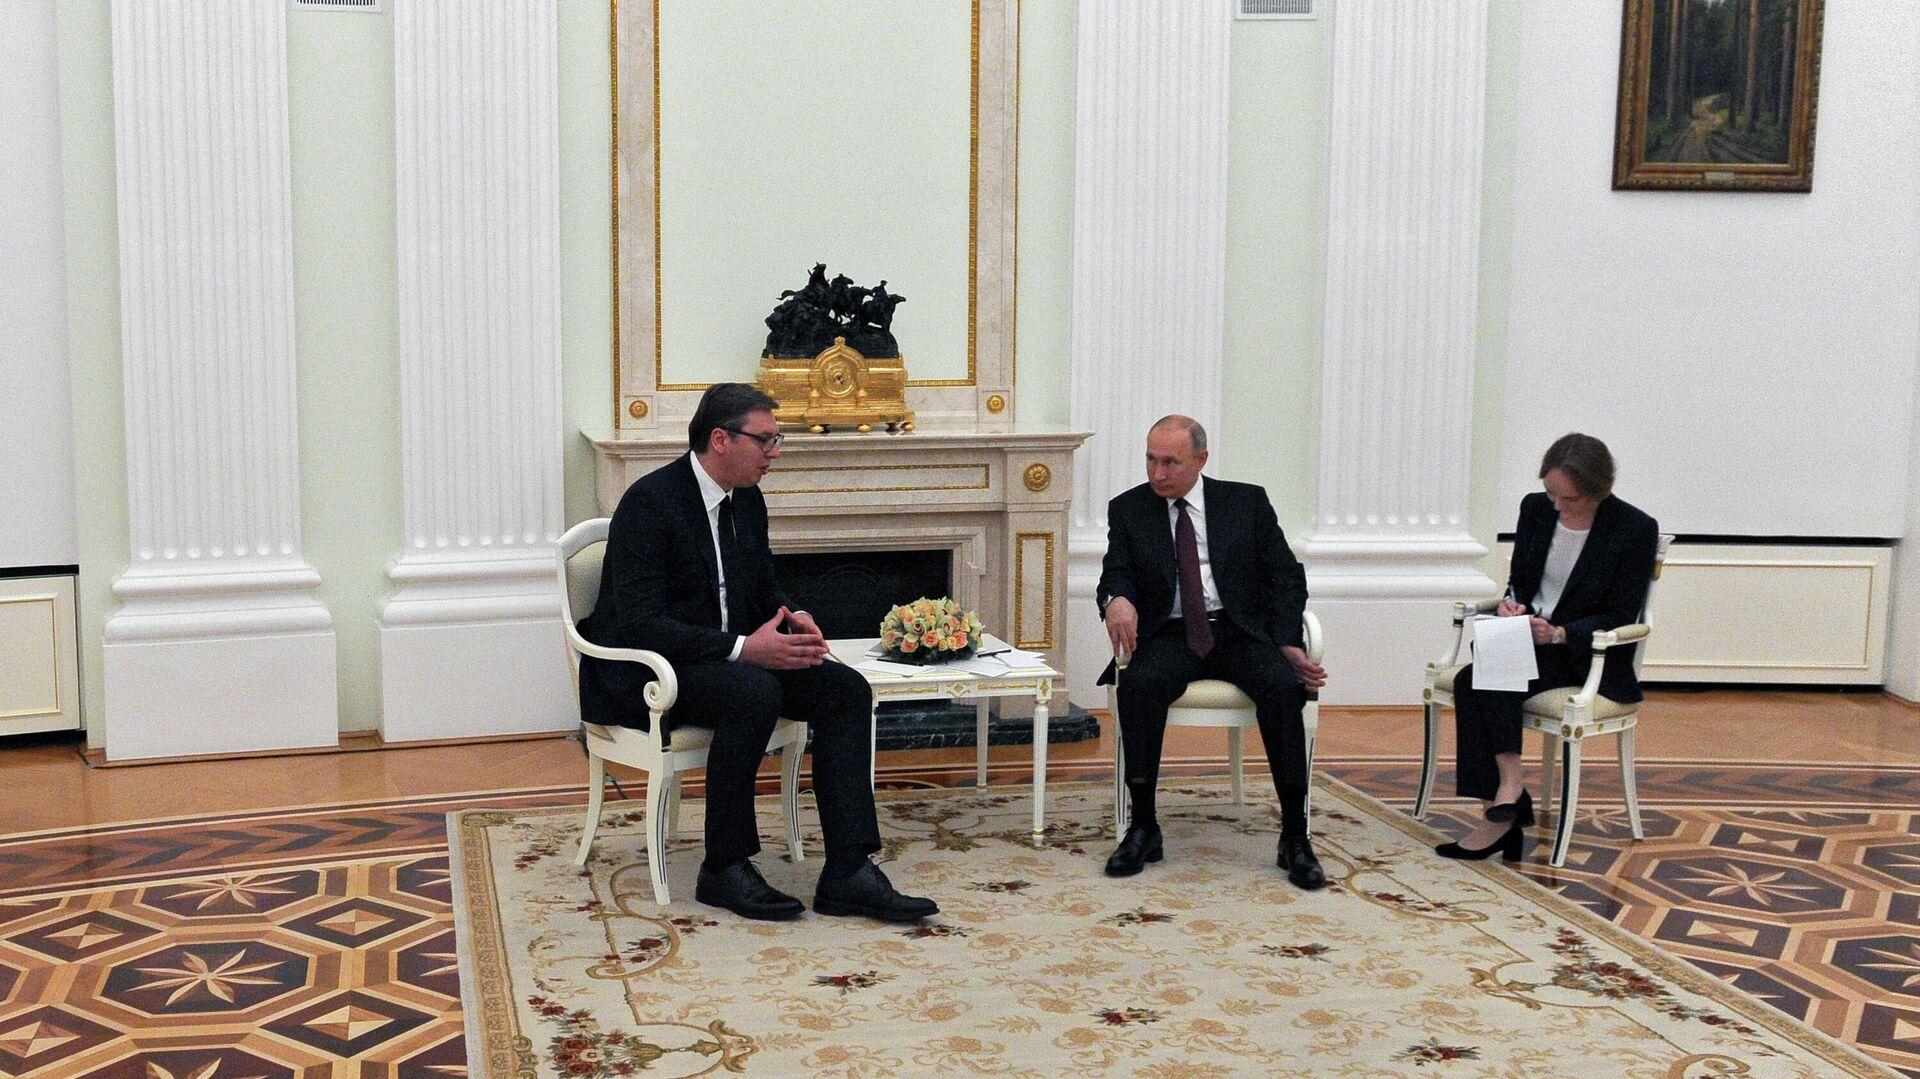 Президент РФ Владимир Путин и президент Сербии Александр Вучич во время встречи - РИА Новости, 1920, 20.08.2020